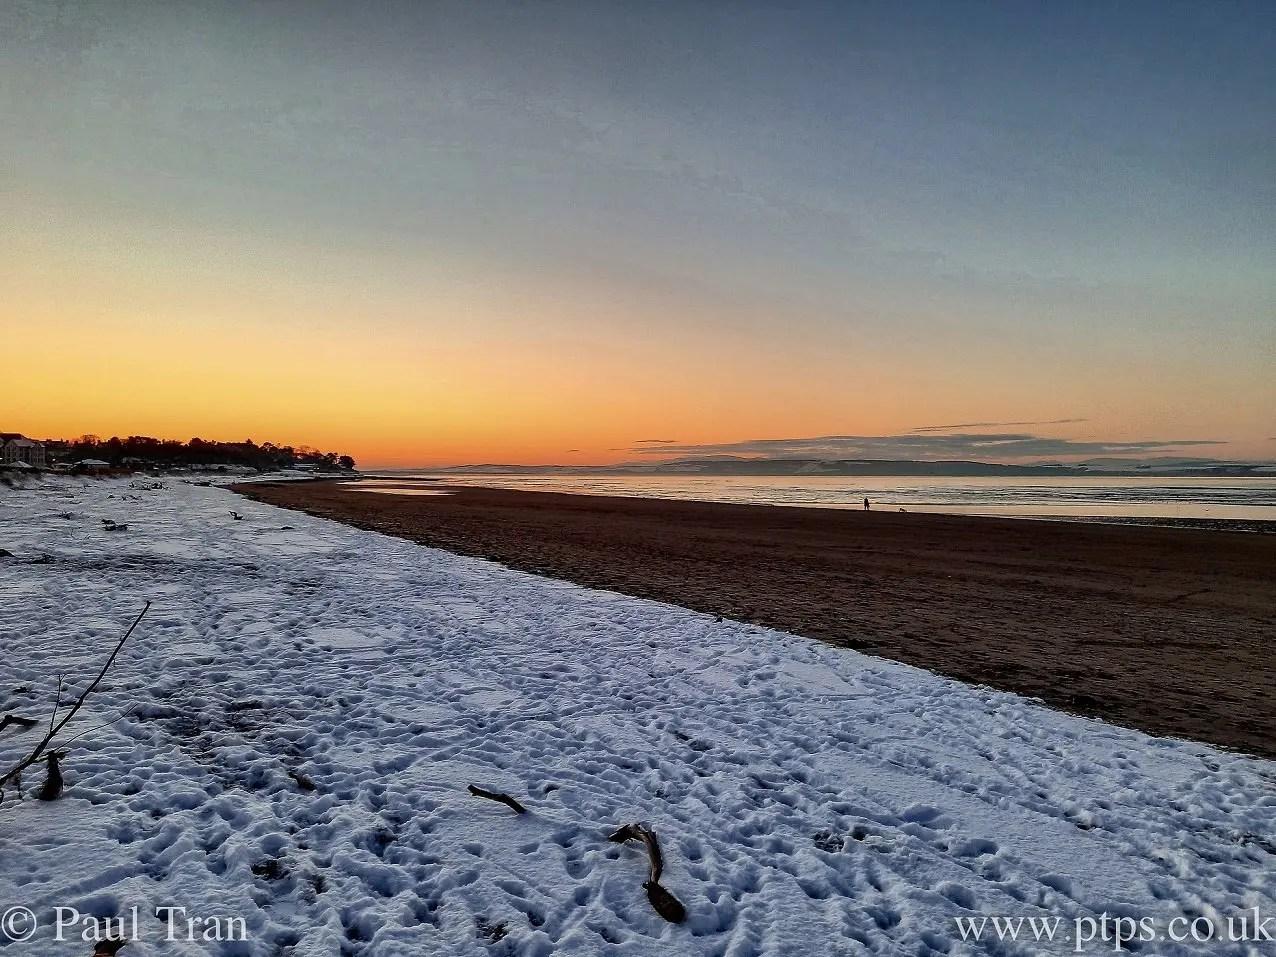 sunset from a snowy beach